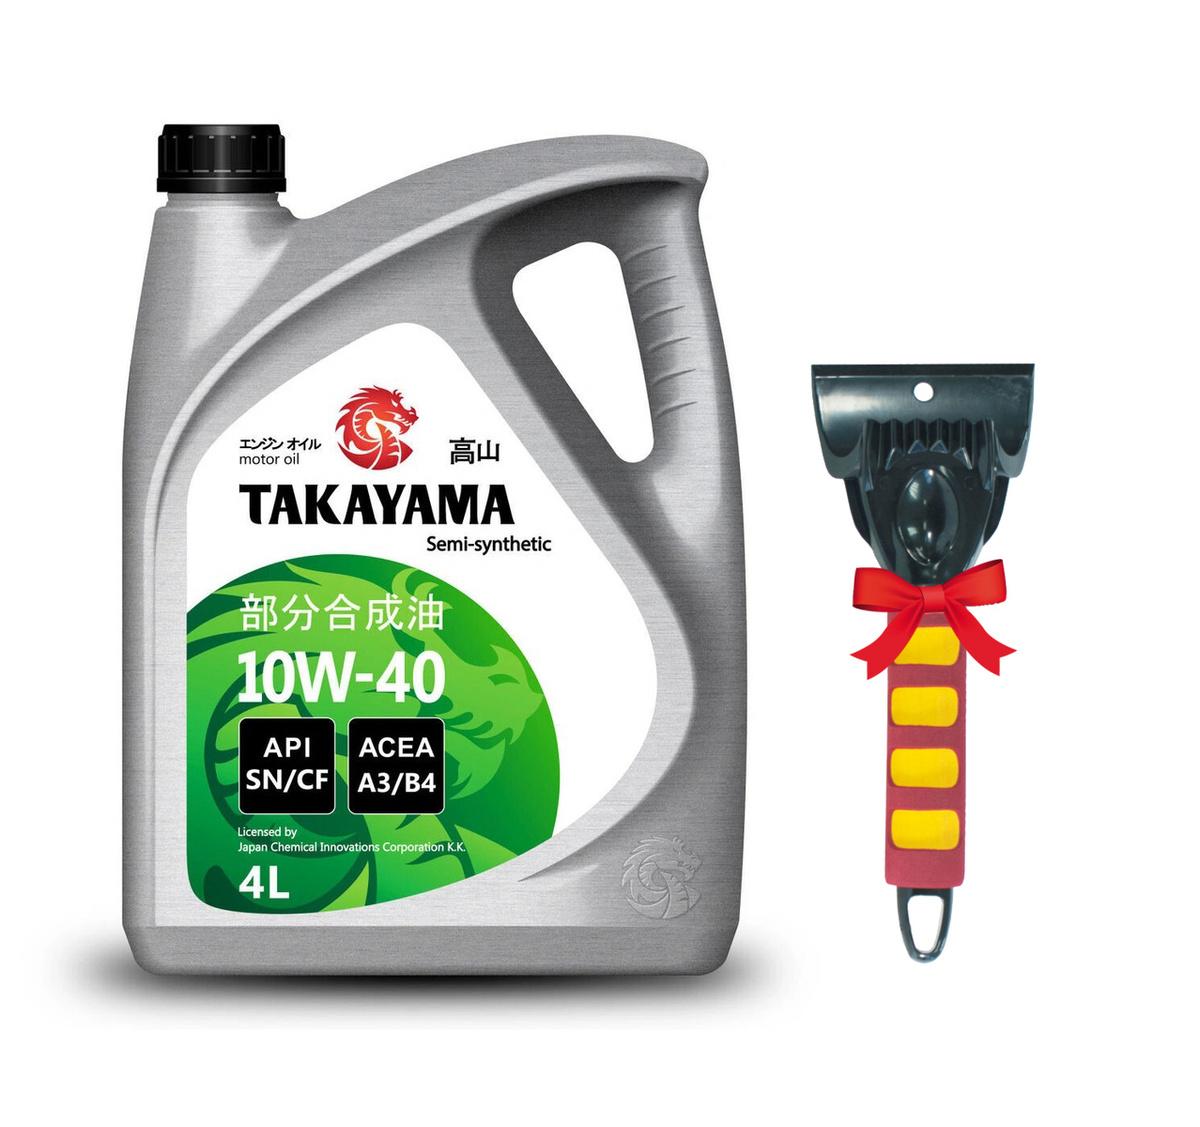 Моторное масло TAKAYAMA SAE API SN/СF 10W-40 Полусинтетическое 4 л #1